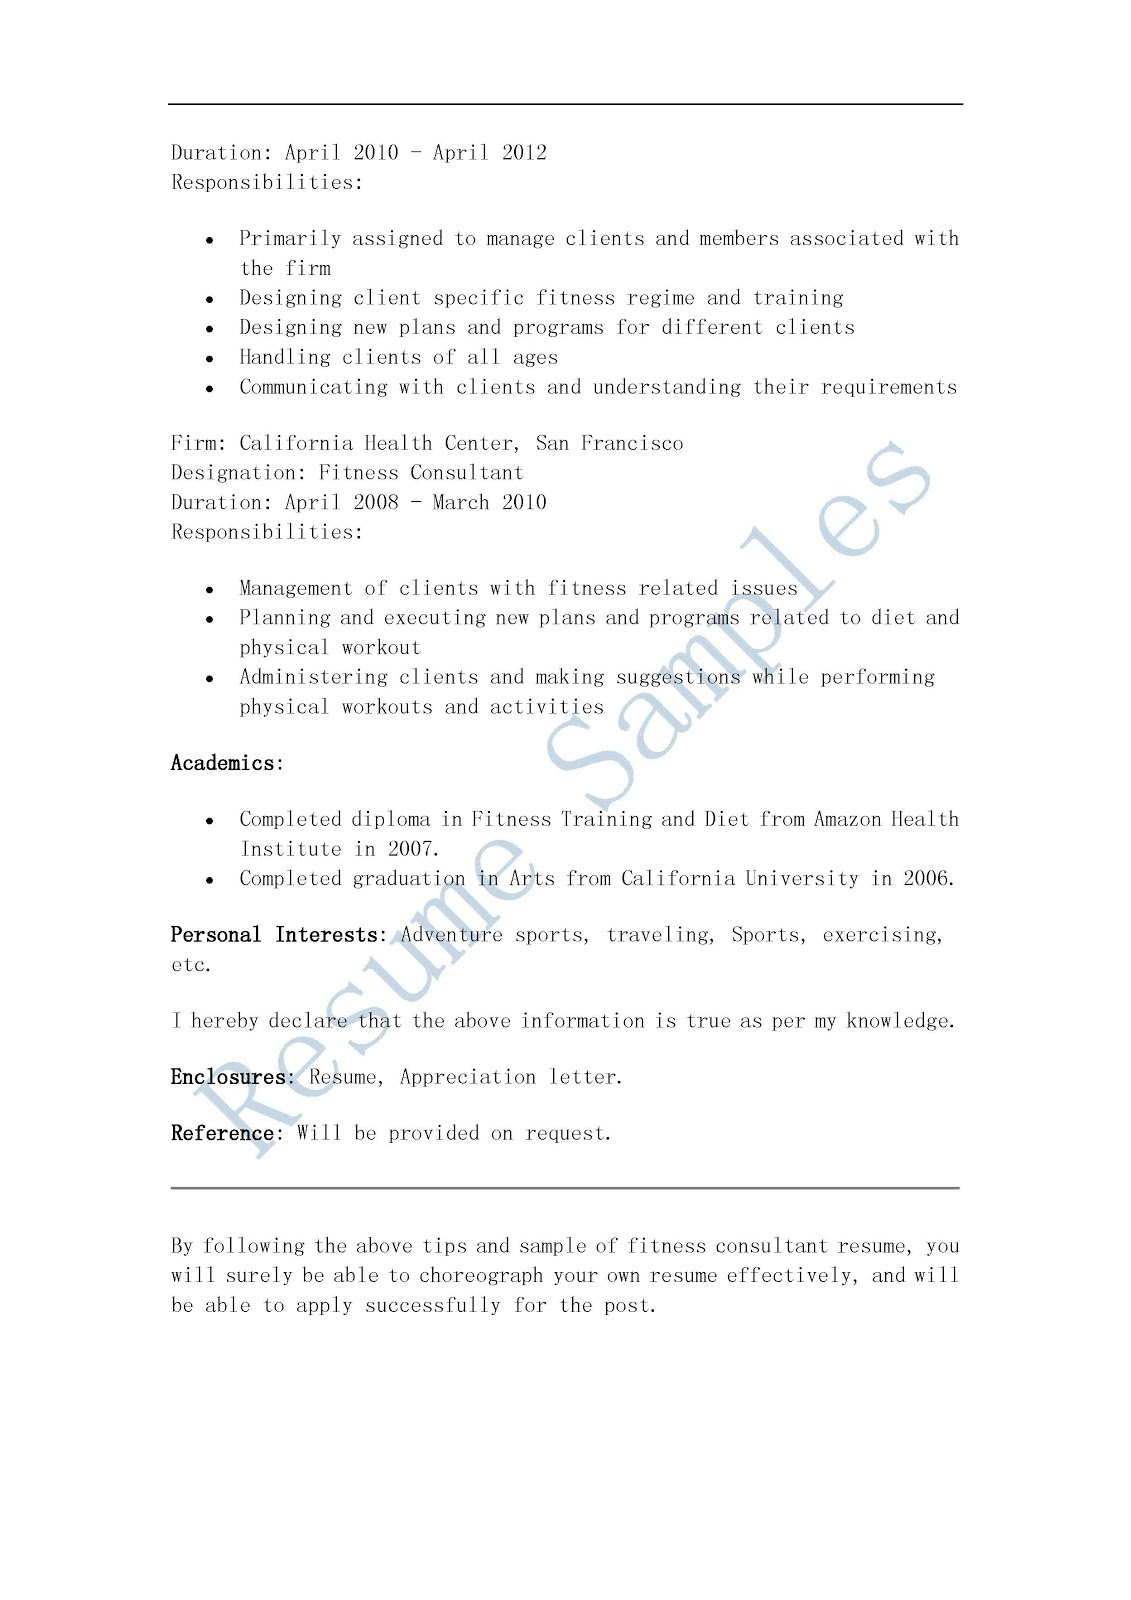 Resume Samples Fitness Consultant Resume